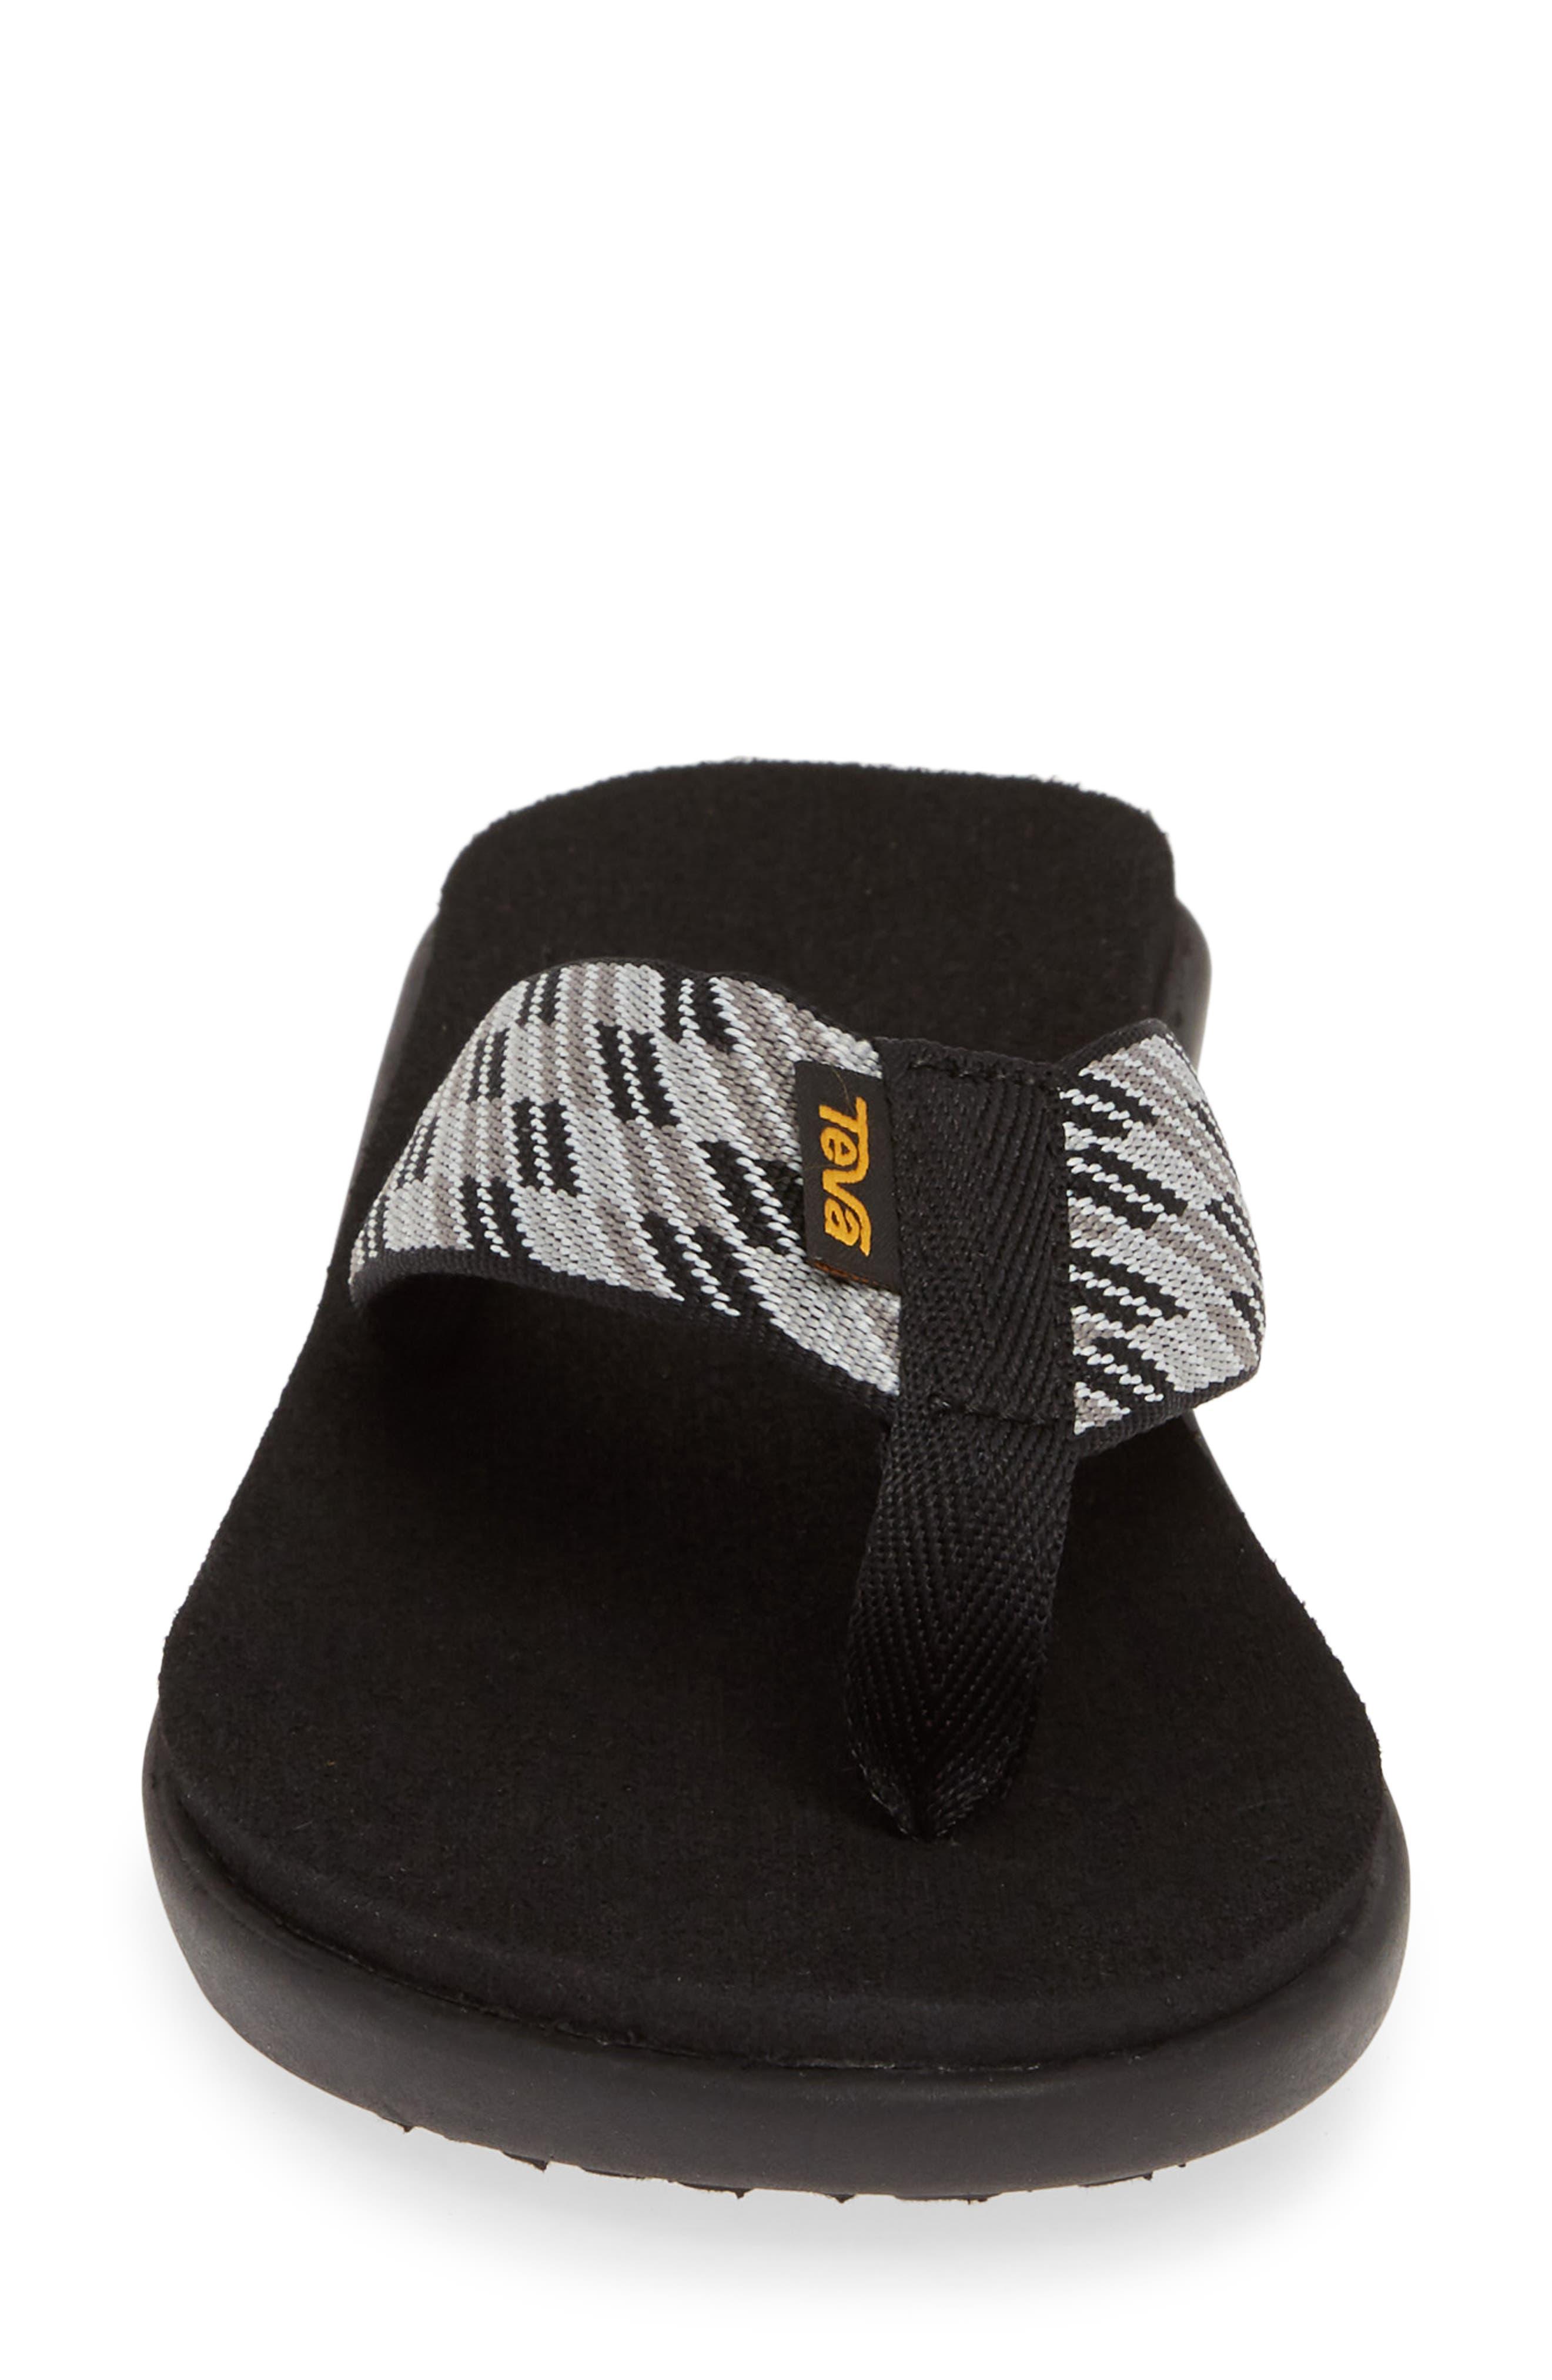 TEVA, Voya Wedge Flip Flop, Alternate thumbnail 4, color, BLACK WHITE FABRIC